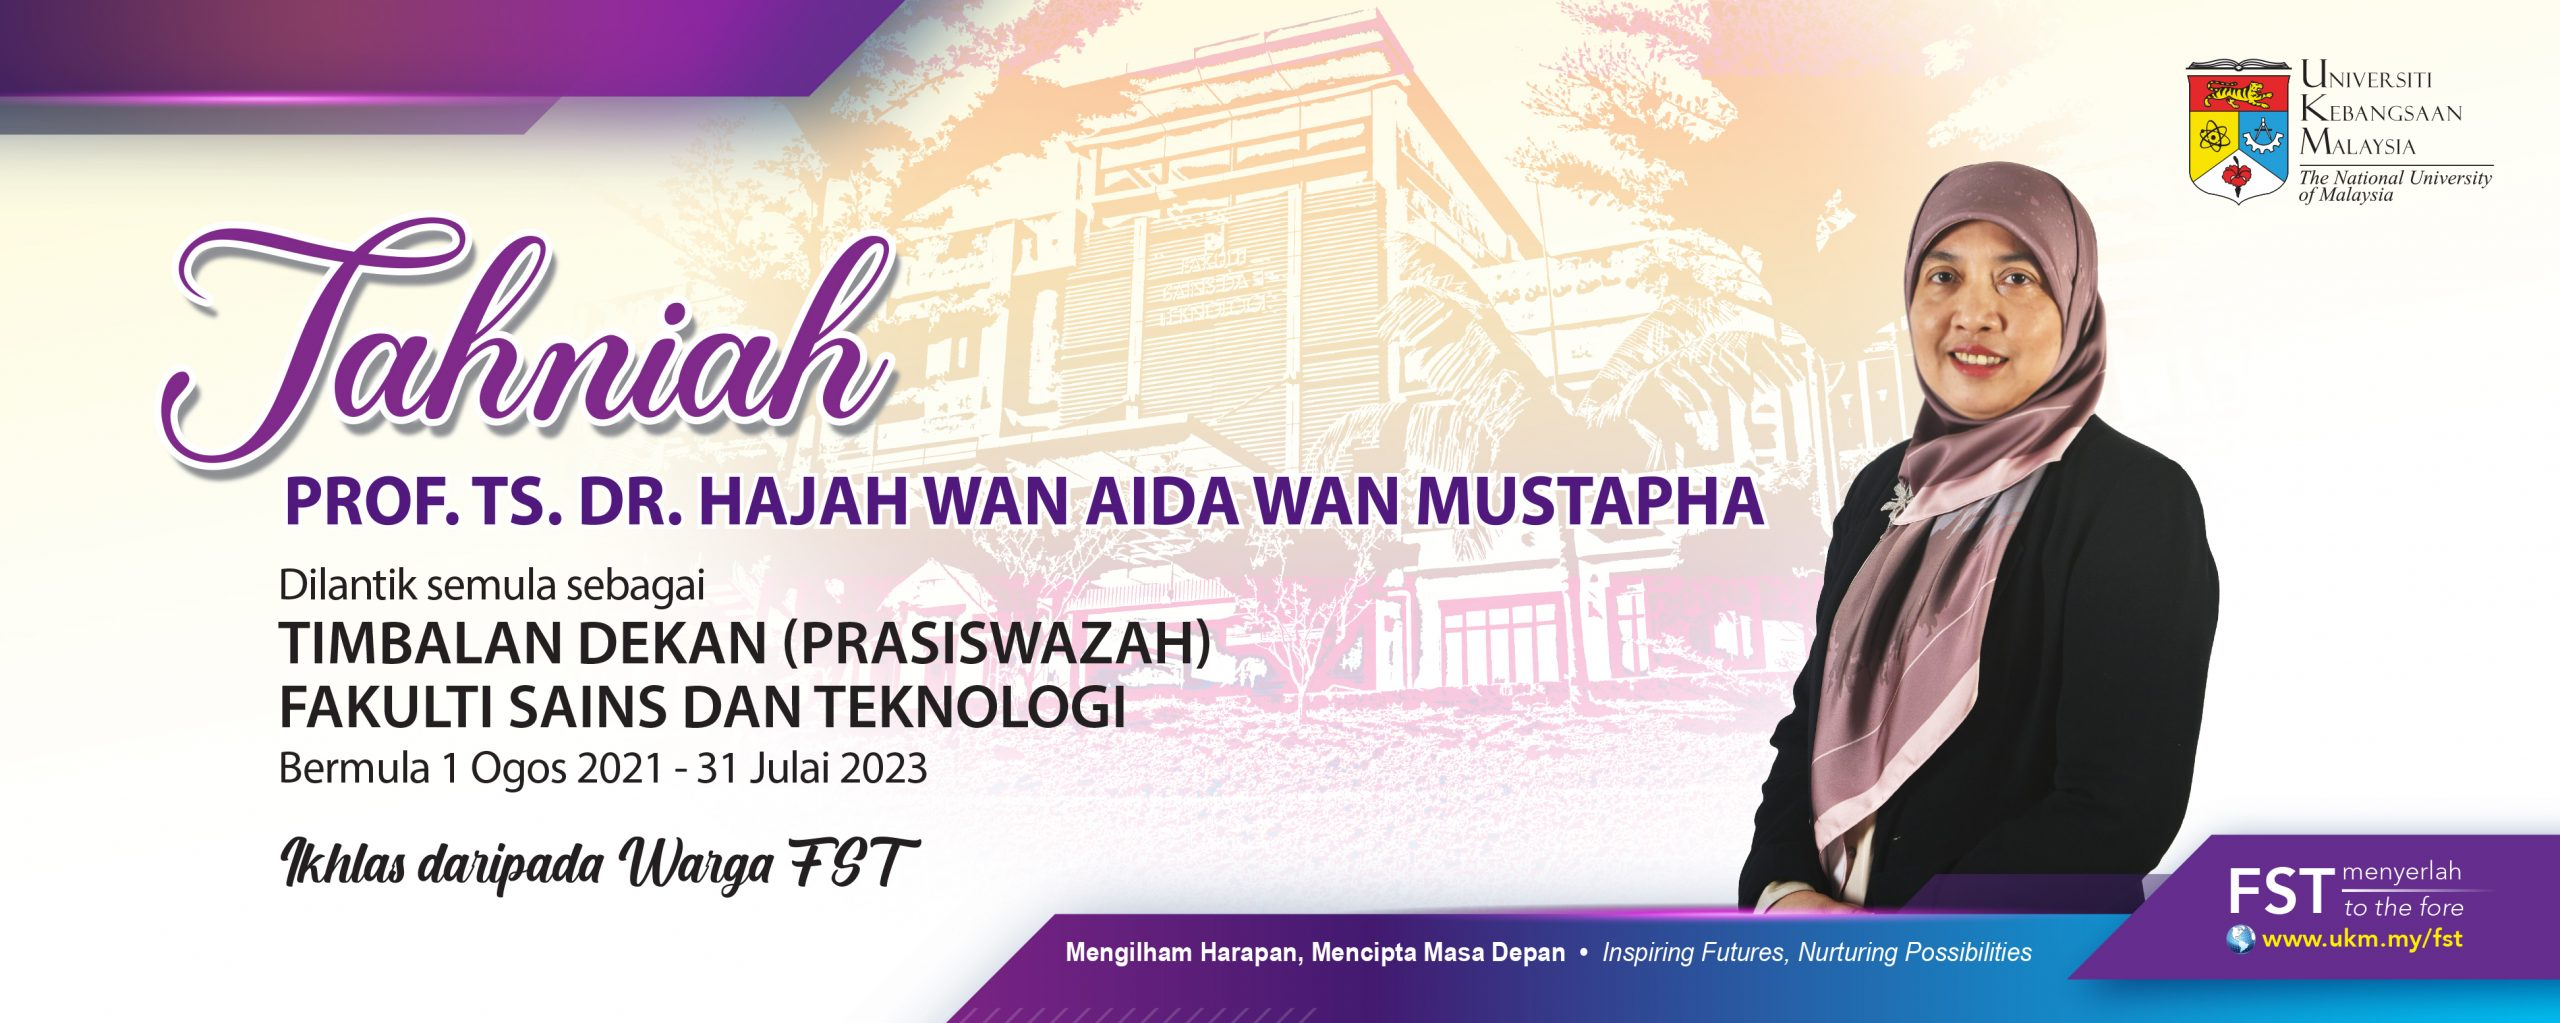 Tahniah Prof. Ts. Dr. Wan Aida